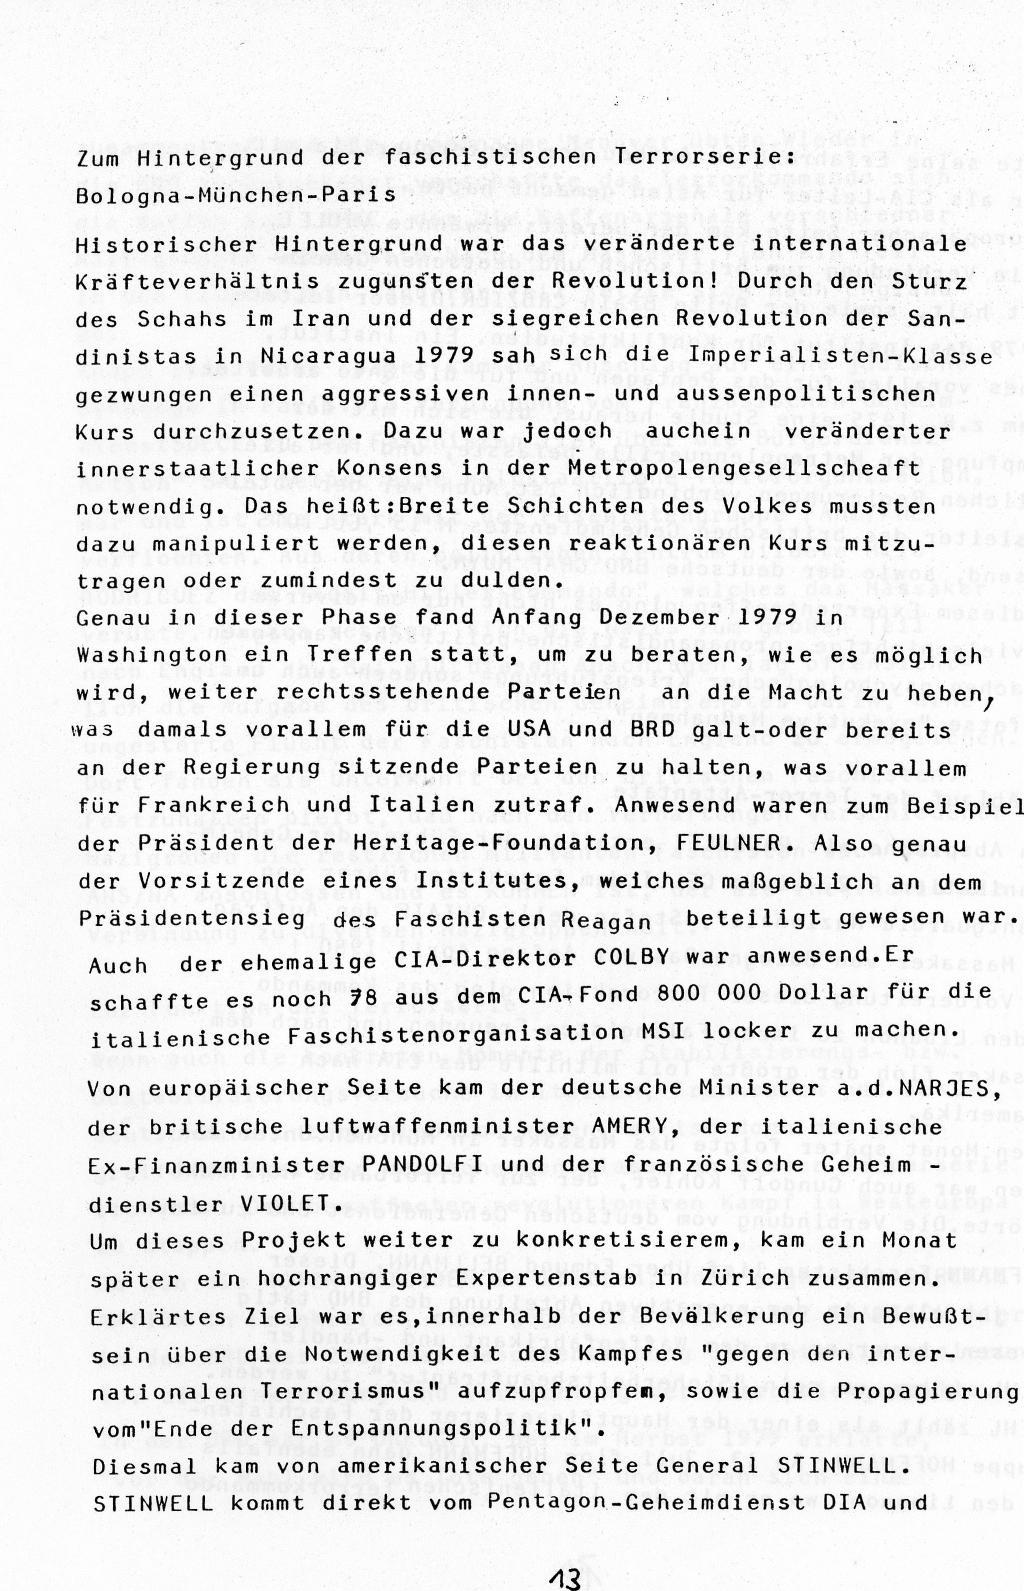 Berlin_1983_Autonome_Gruppen_Faschismus_im_Kapitalismus_13